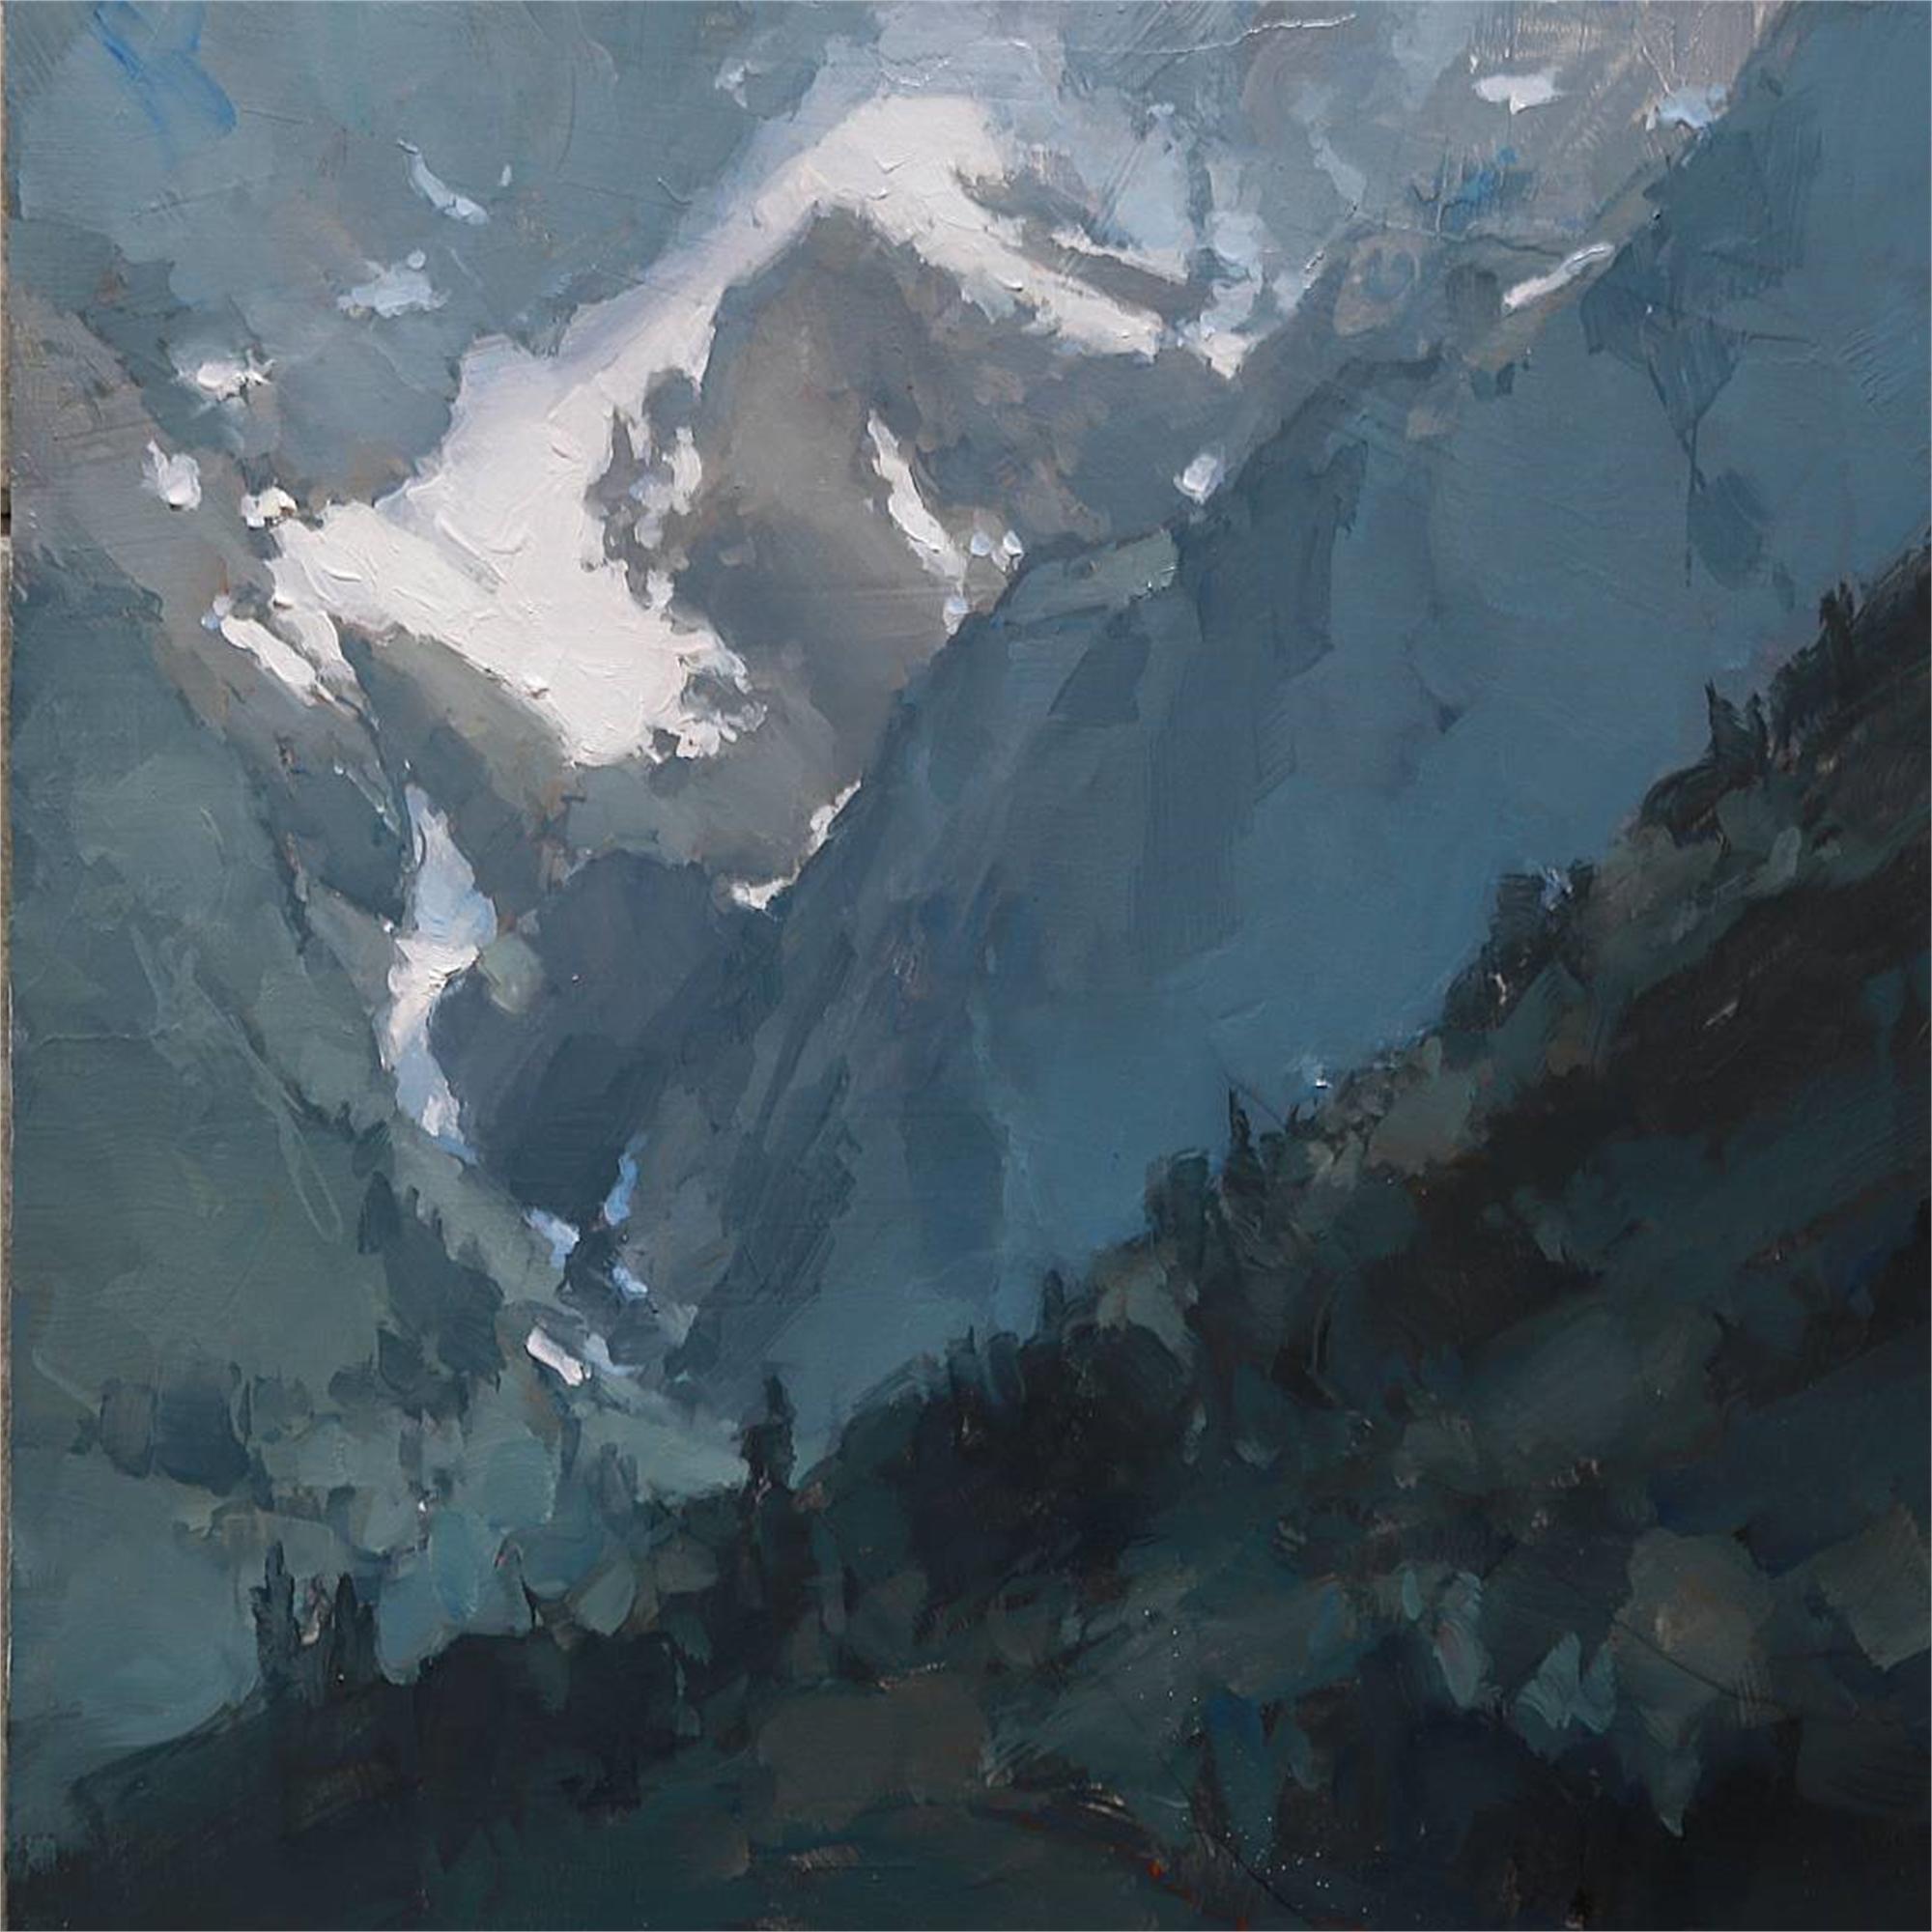 Bavarian Alps by James Kroner